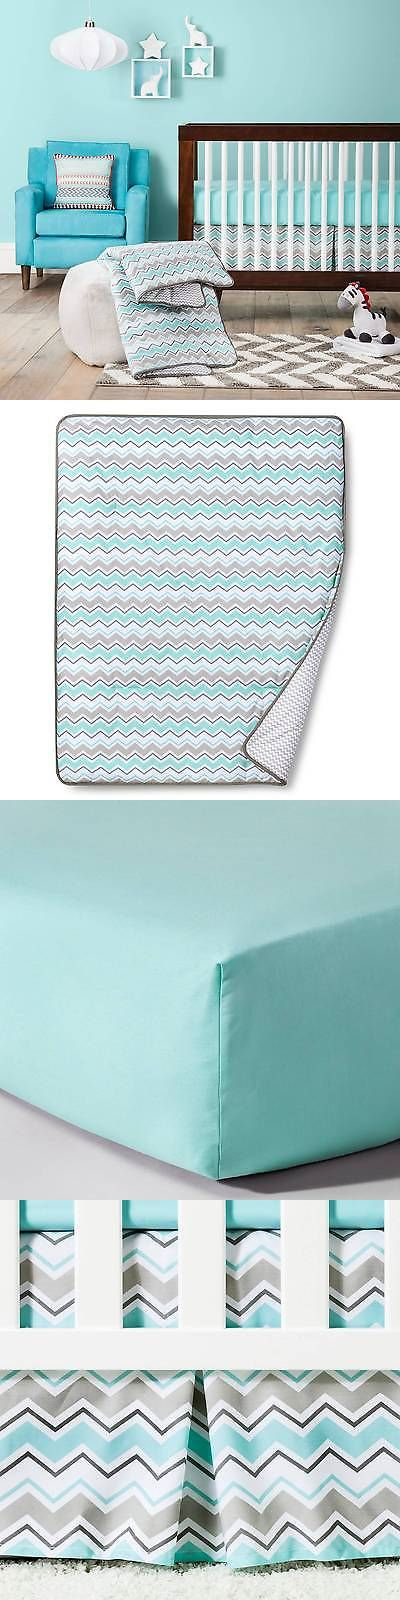 Baby Nursery: Trend Lab Chevron Crib Bedding Set -> BUY IT NOW ONLY: $75.99 on eBay!